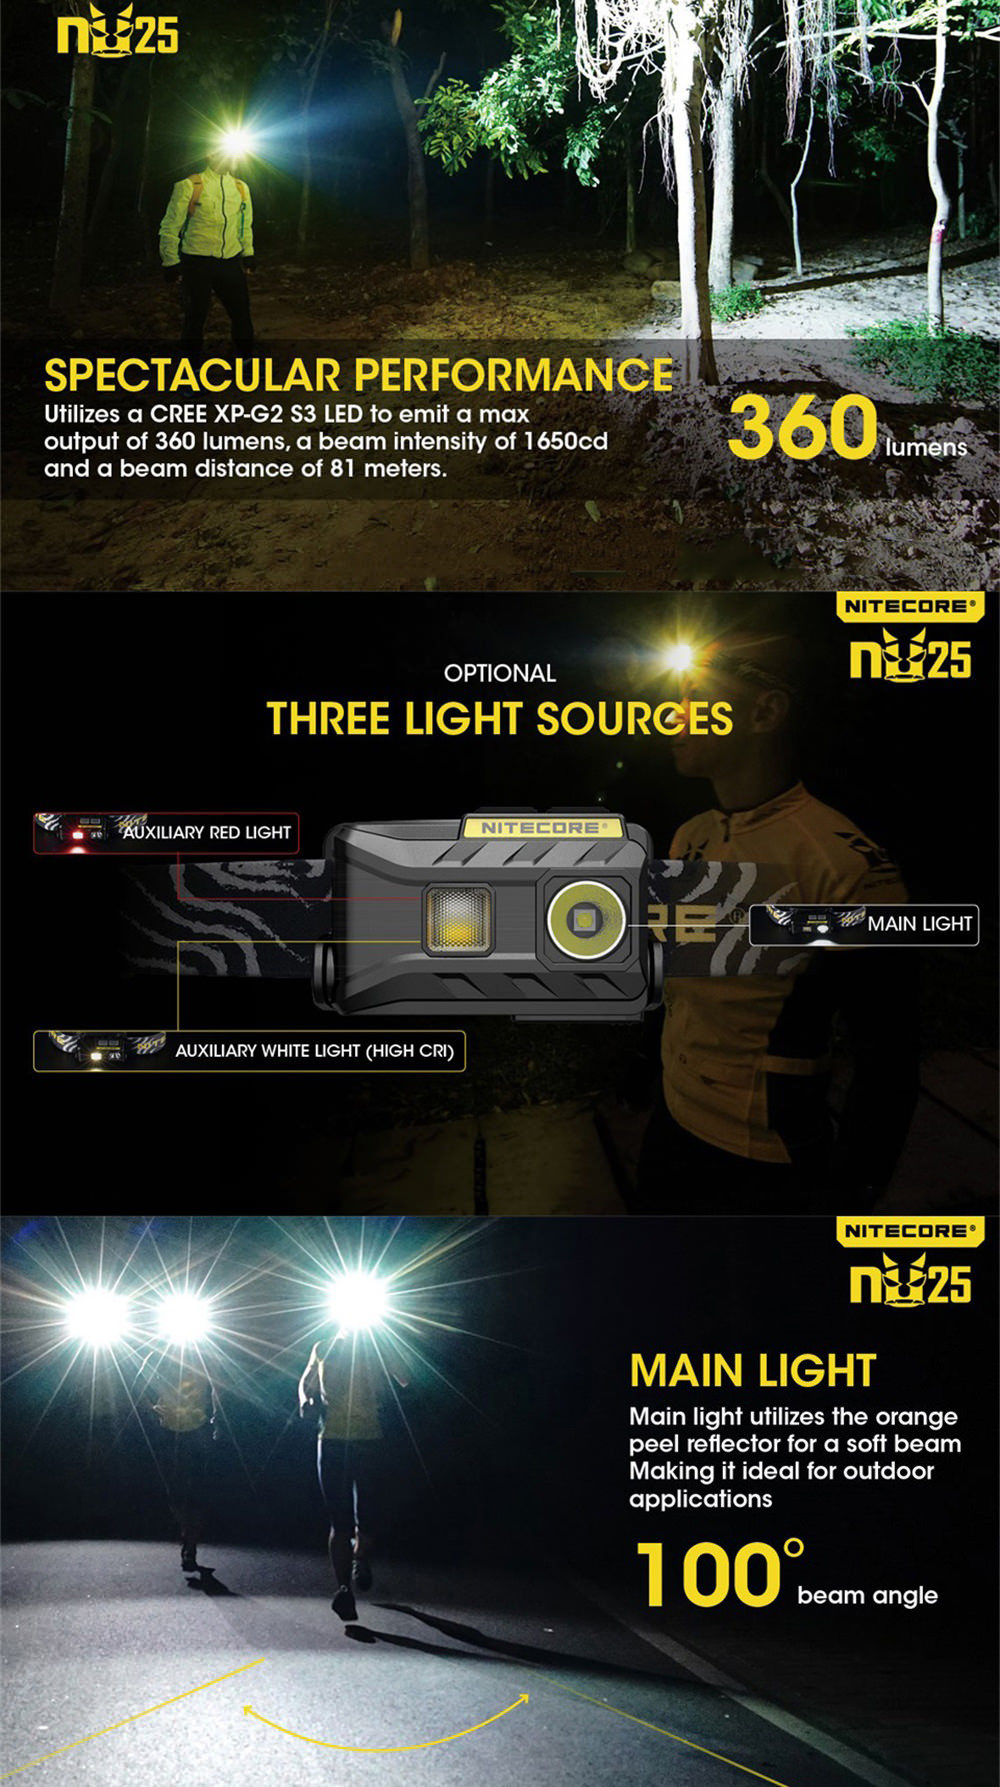 buy nitecore nu25 headlamp